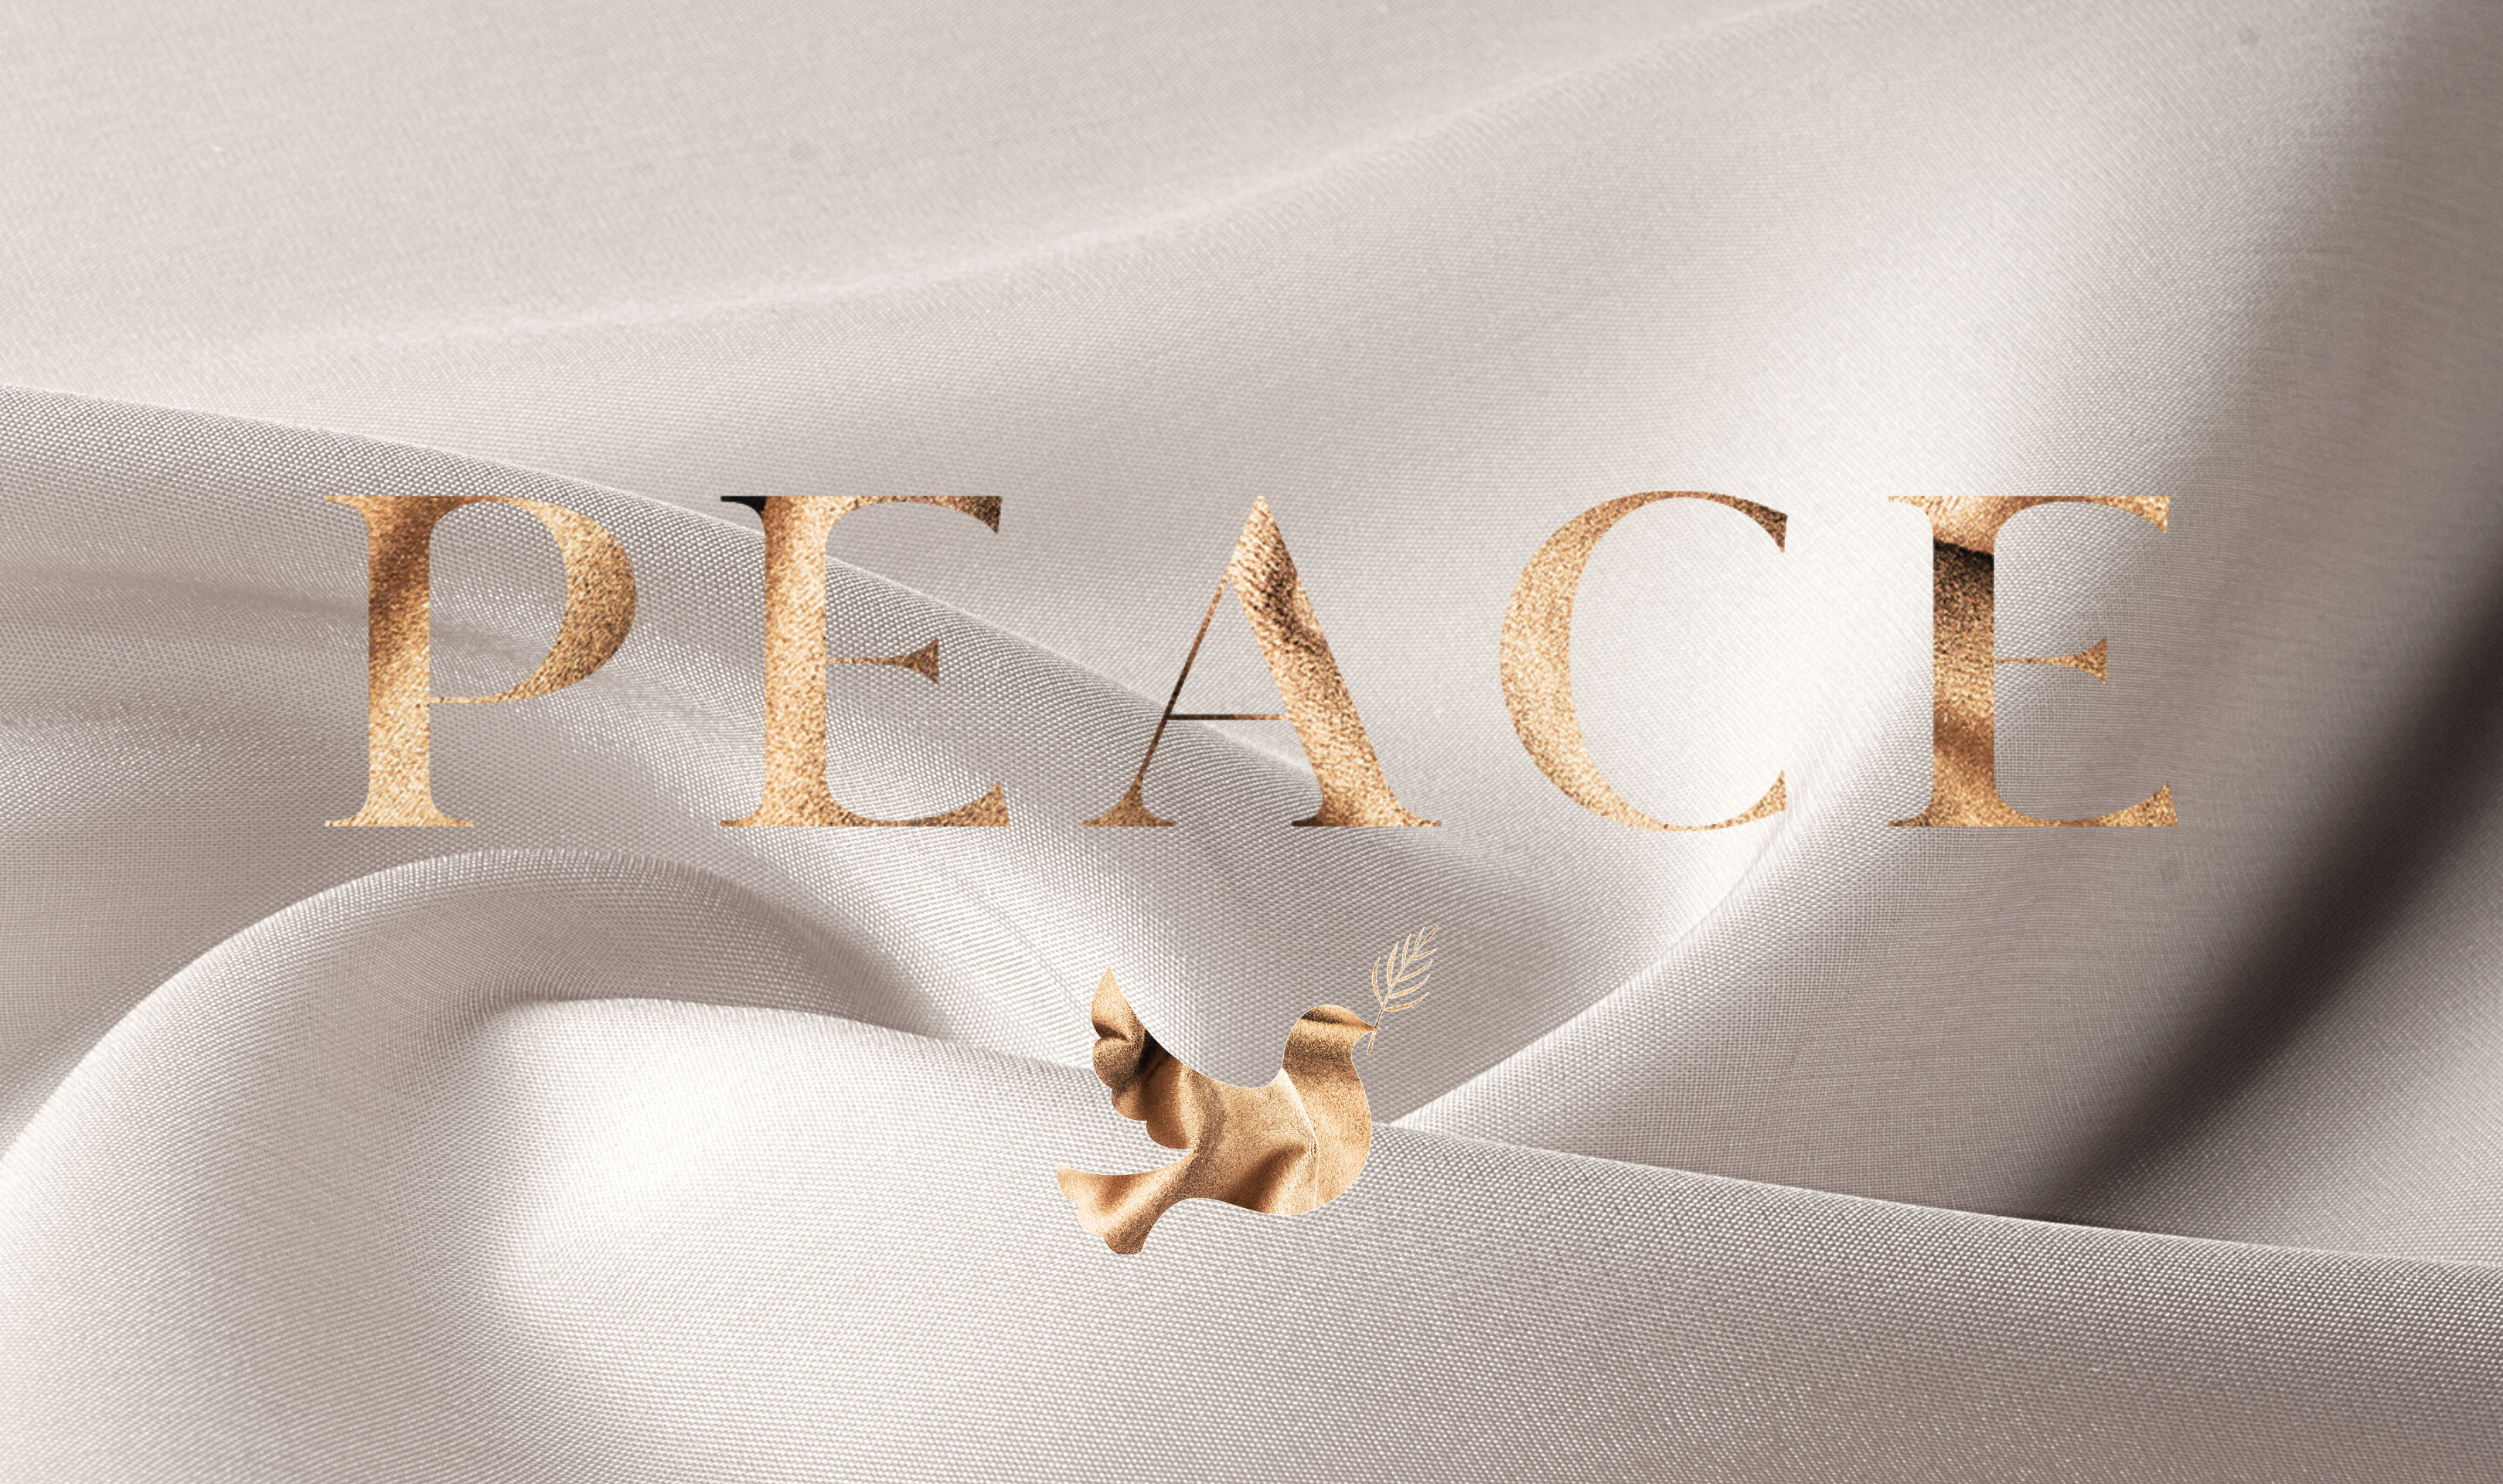 CHRISTMAS - PEACE